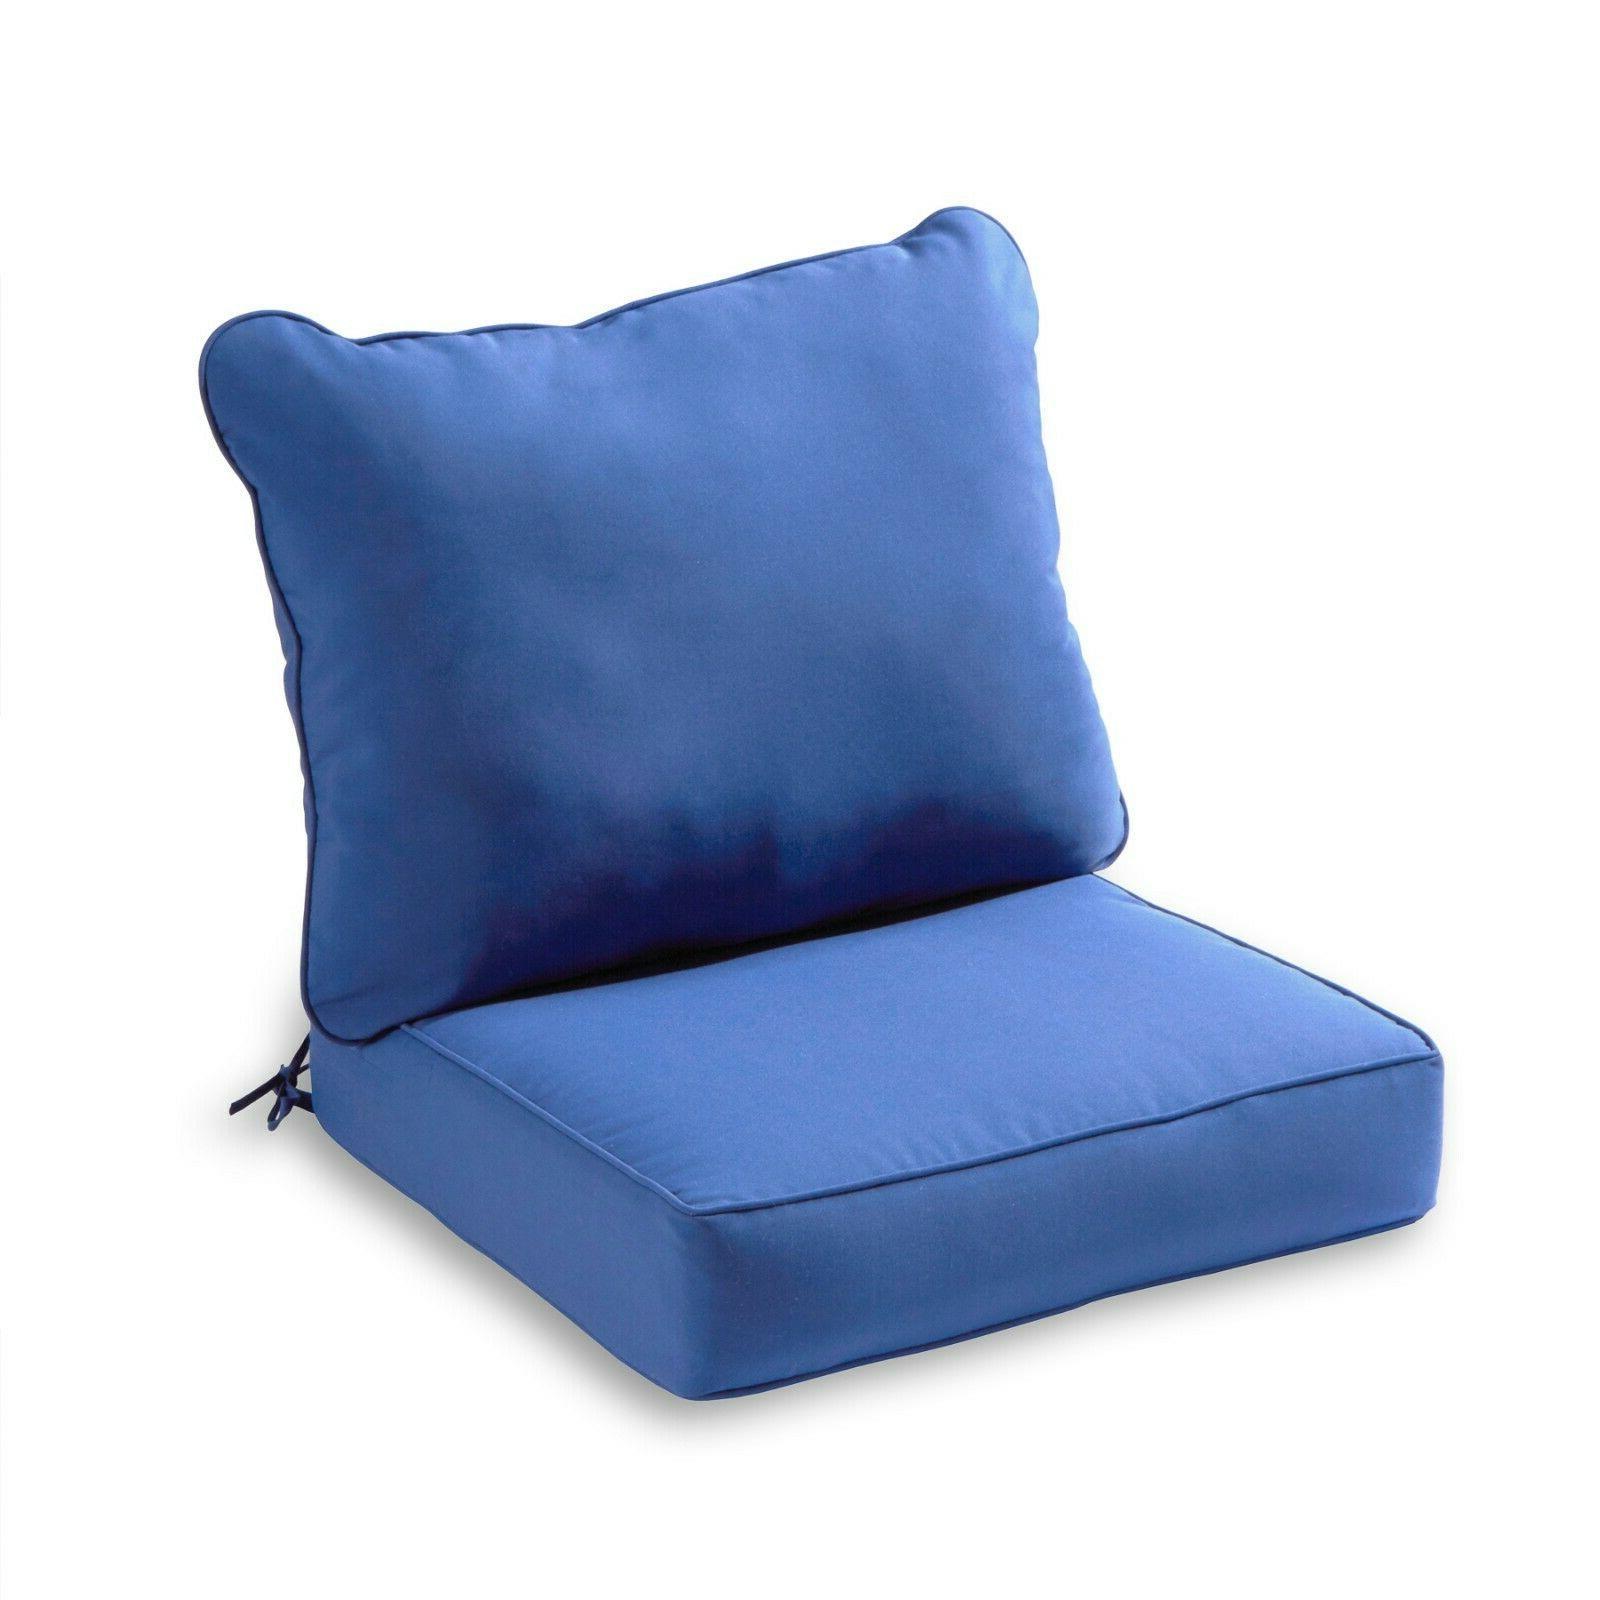 Outdoor Deep Set Chair Pillow Furniture Seating